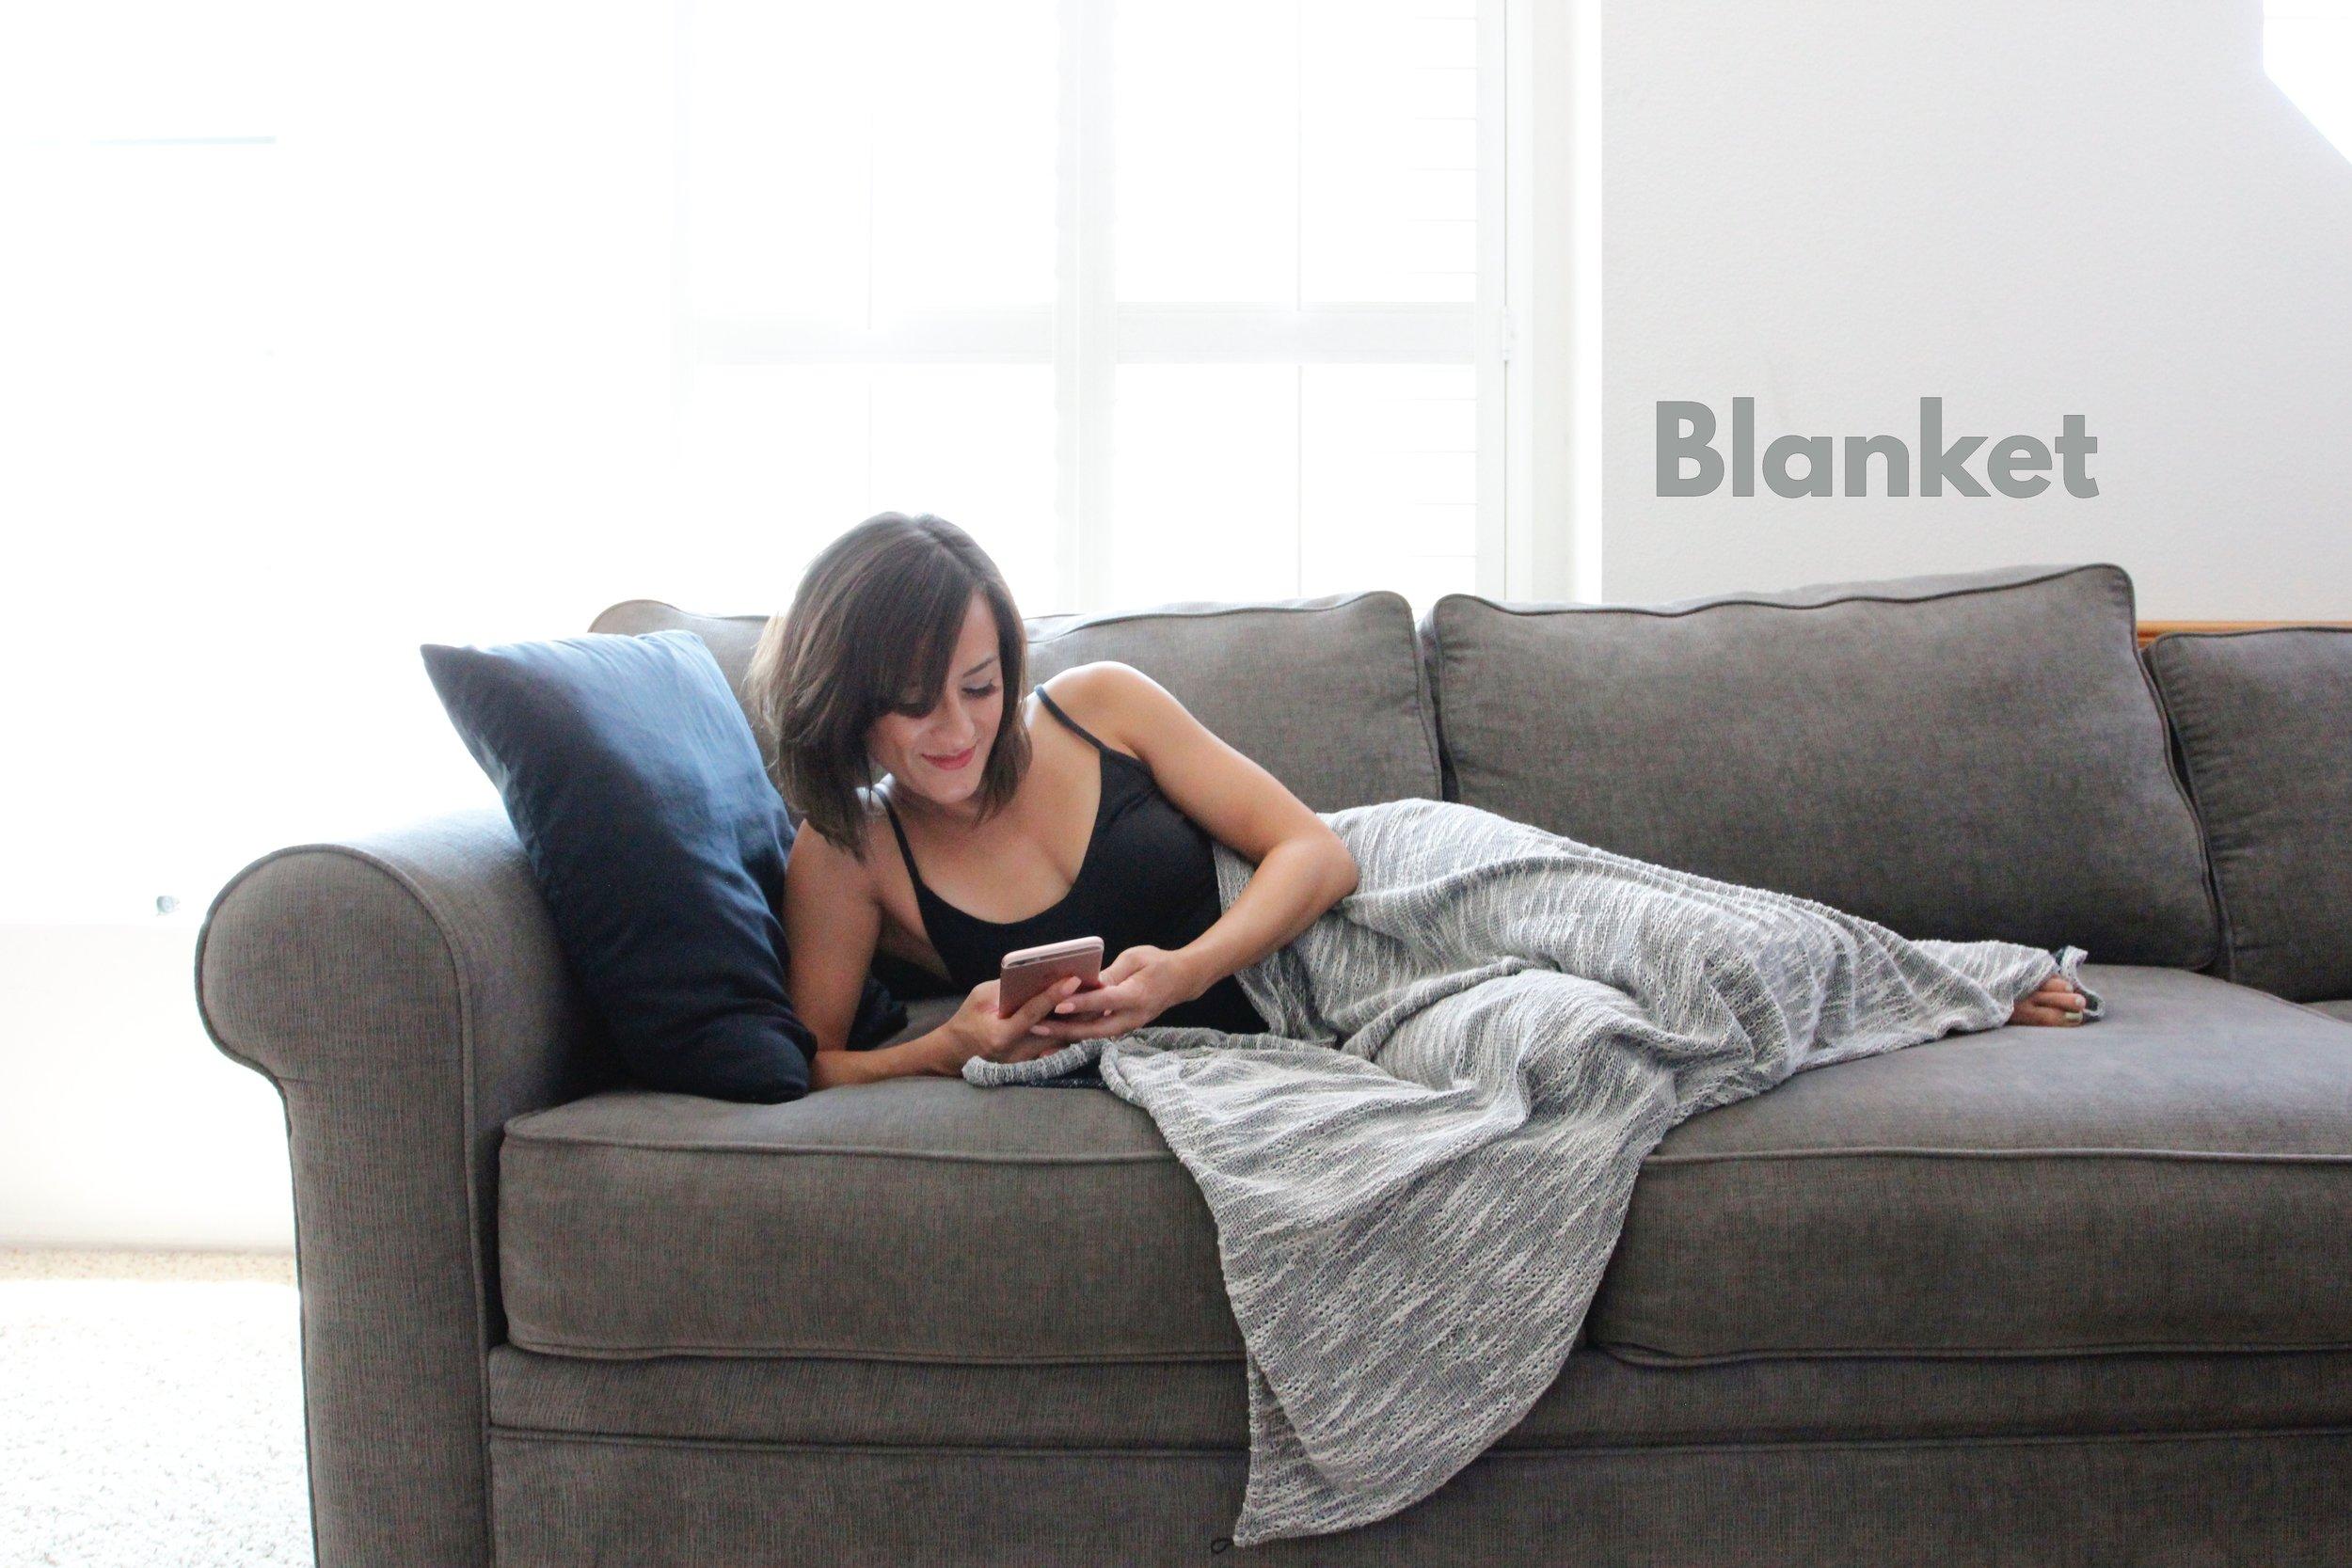 MFS ELLERALI51 Blanket.jpg